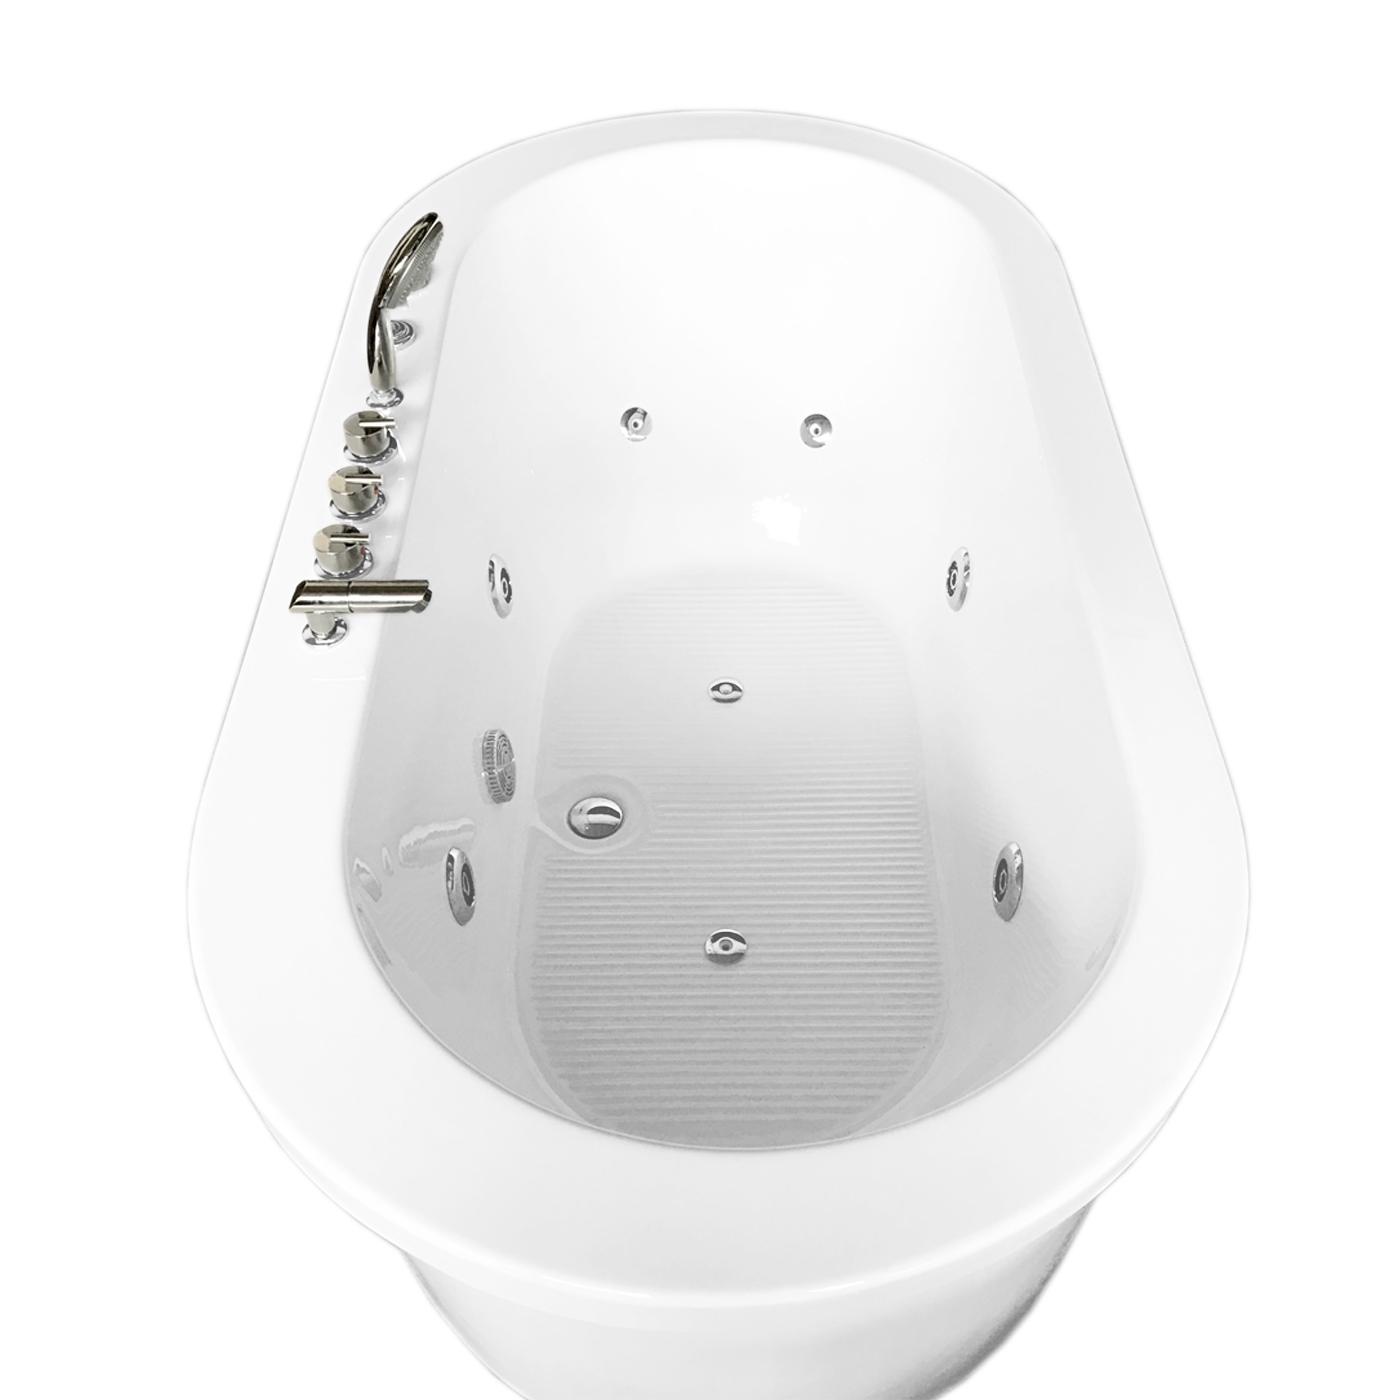 Vasca da bagno idromassaggio bianca 185cm x 95cm freestanding - Vasca da bagno in francese ...